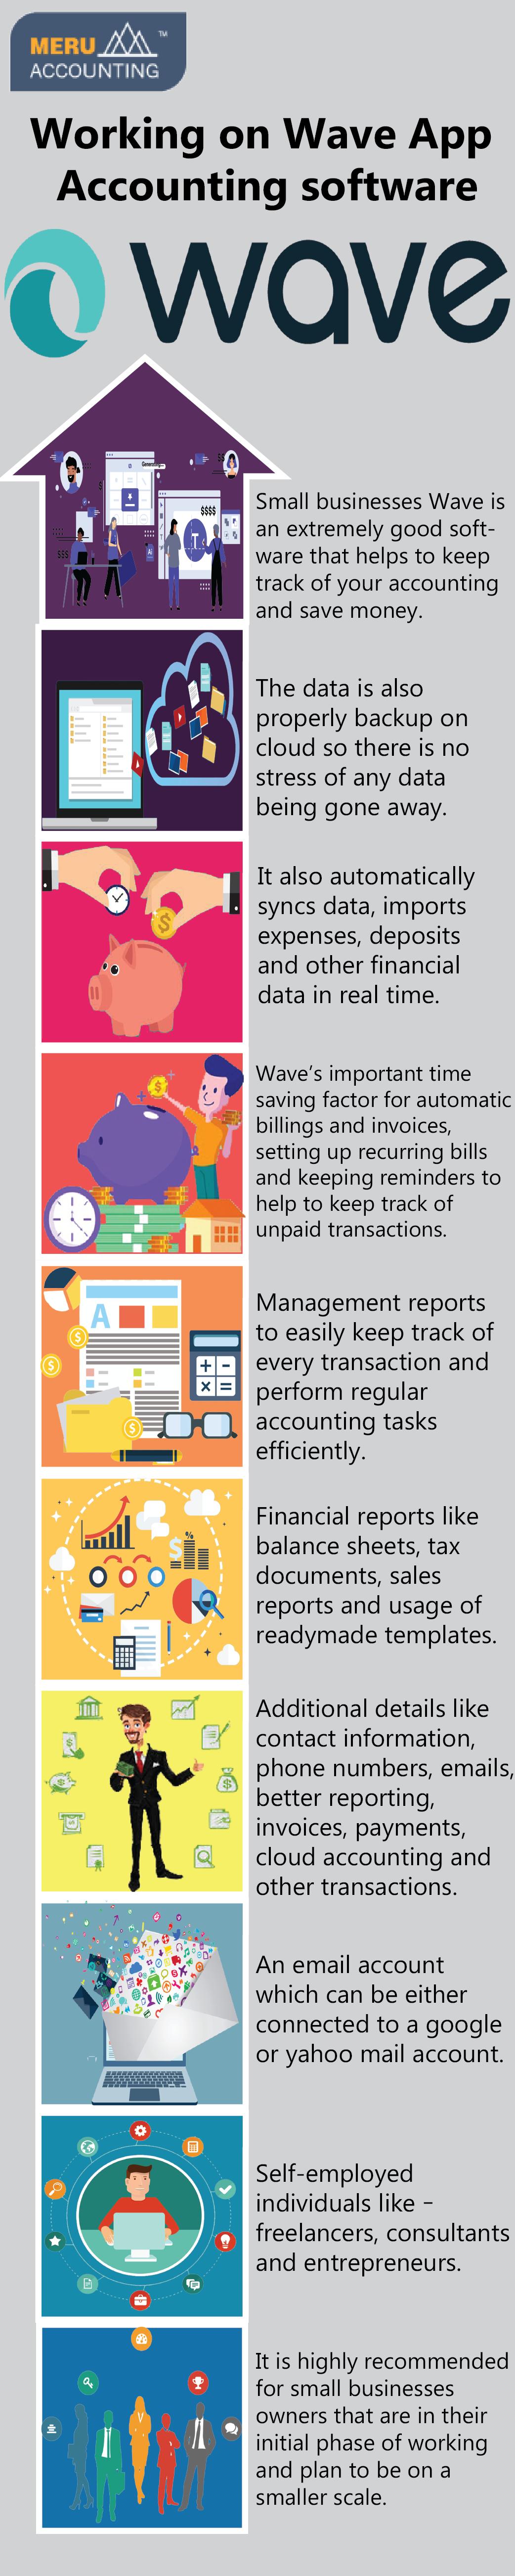 Pin By Meruaccounting On Accounting Blog Saving Money Accounting Software Meru